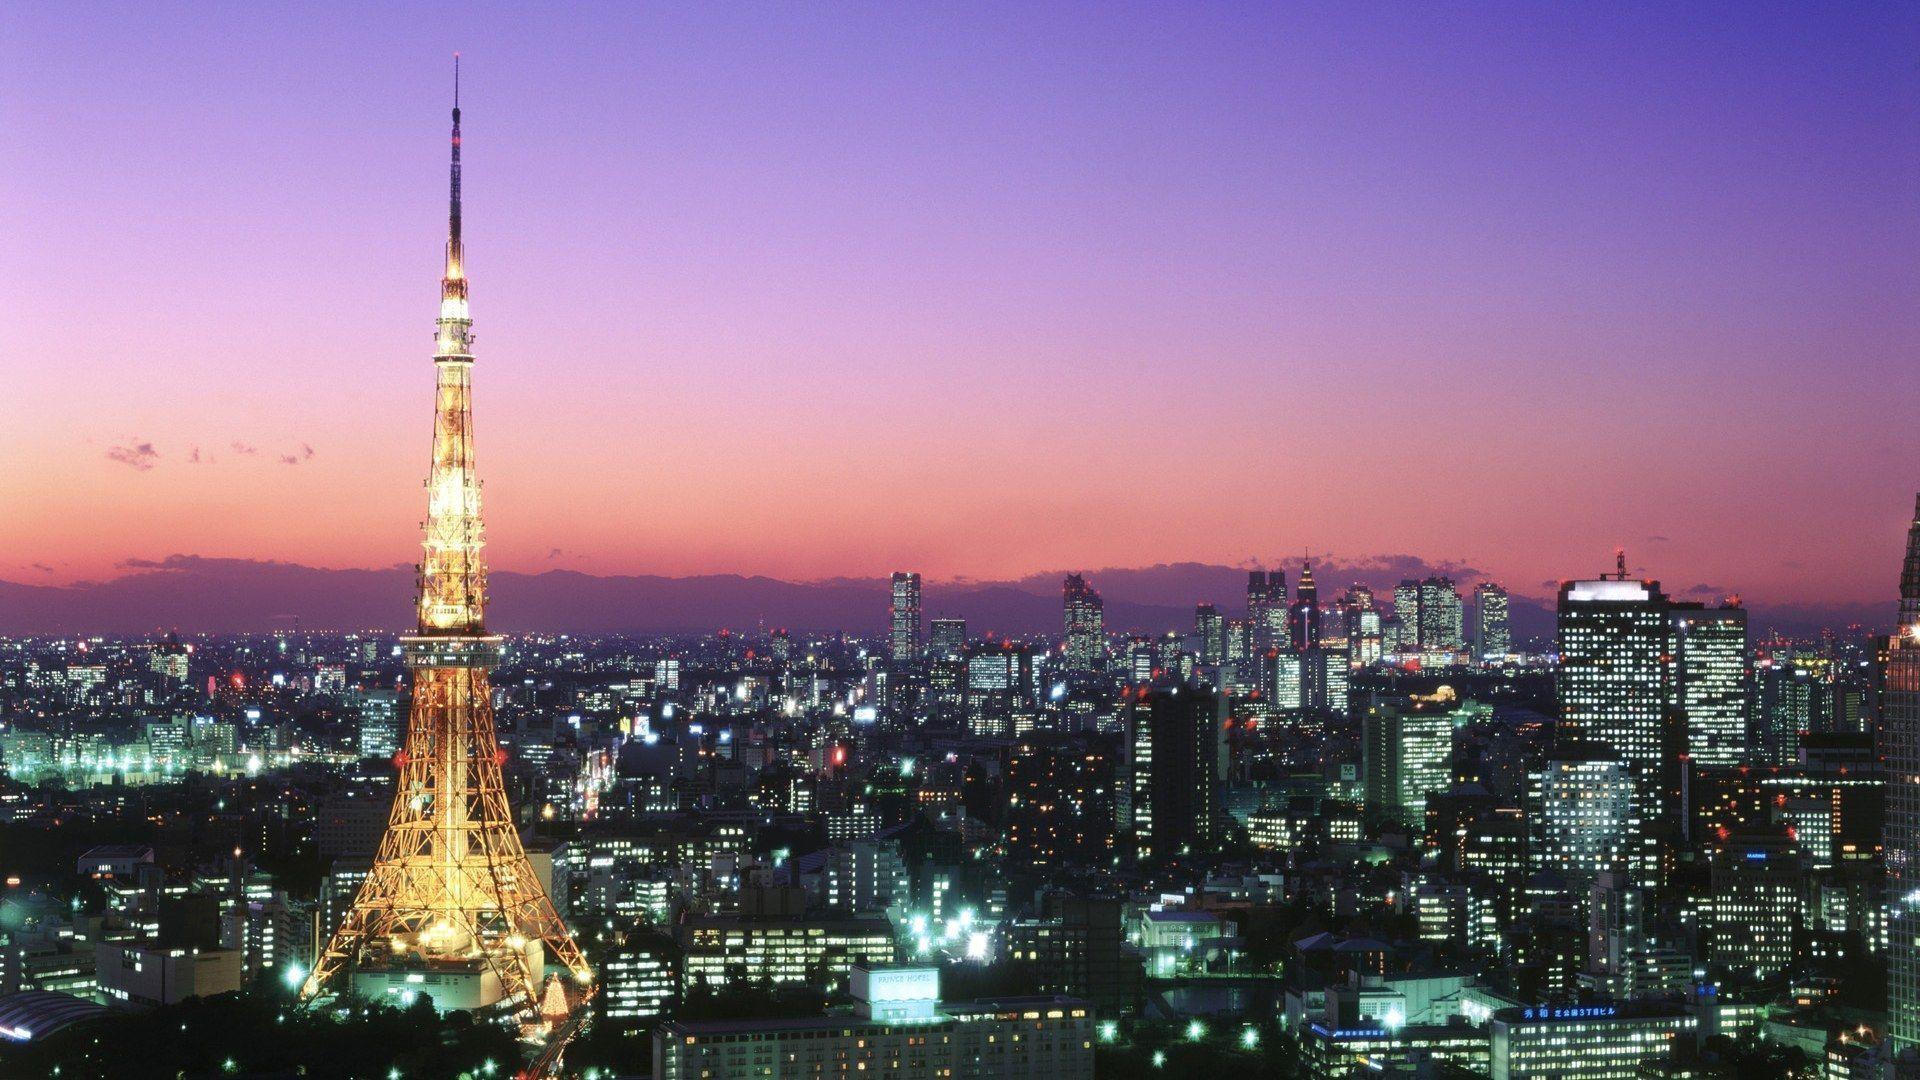 Tokyo Tower Wallpaper HD #20037) wallpaper - Wallatar.com